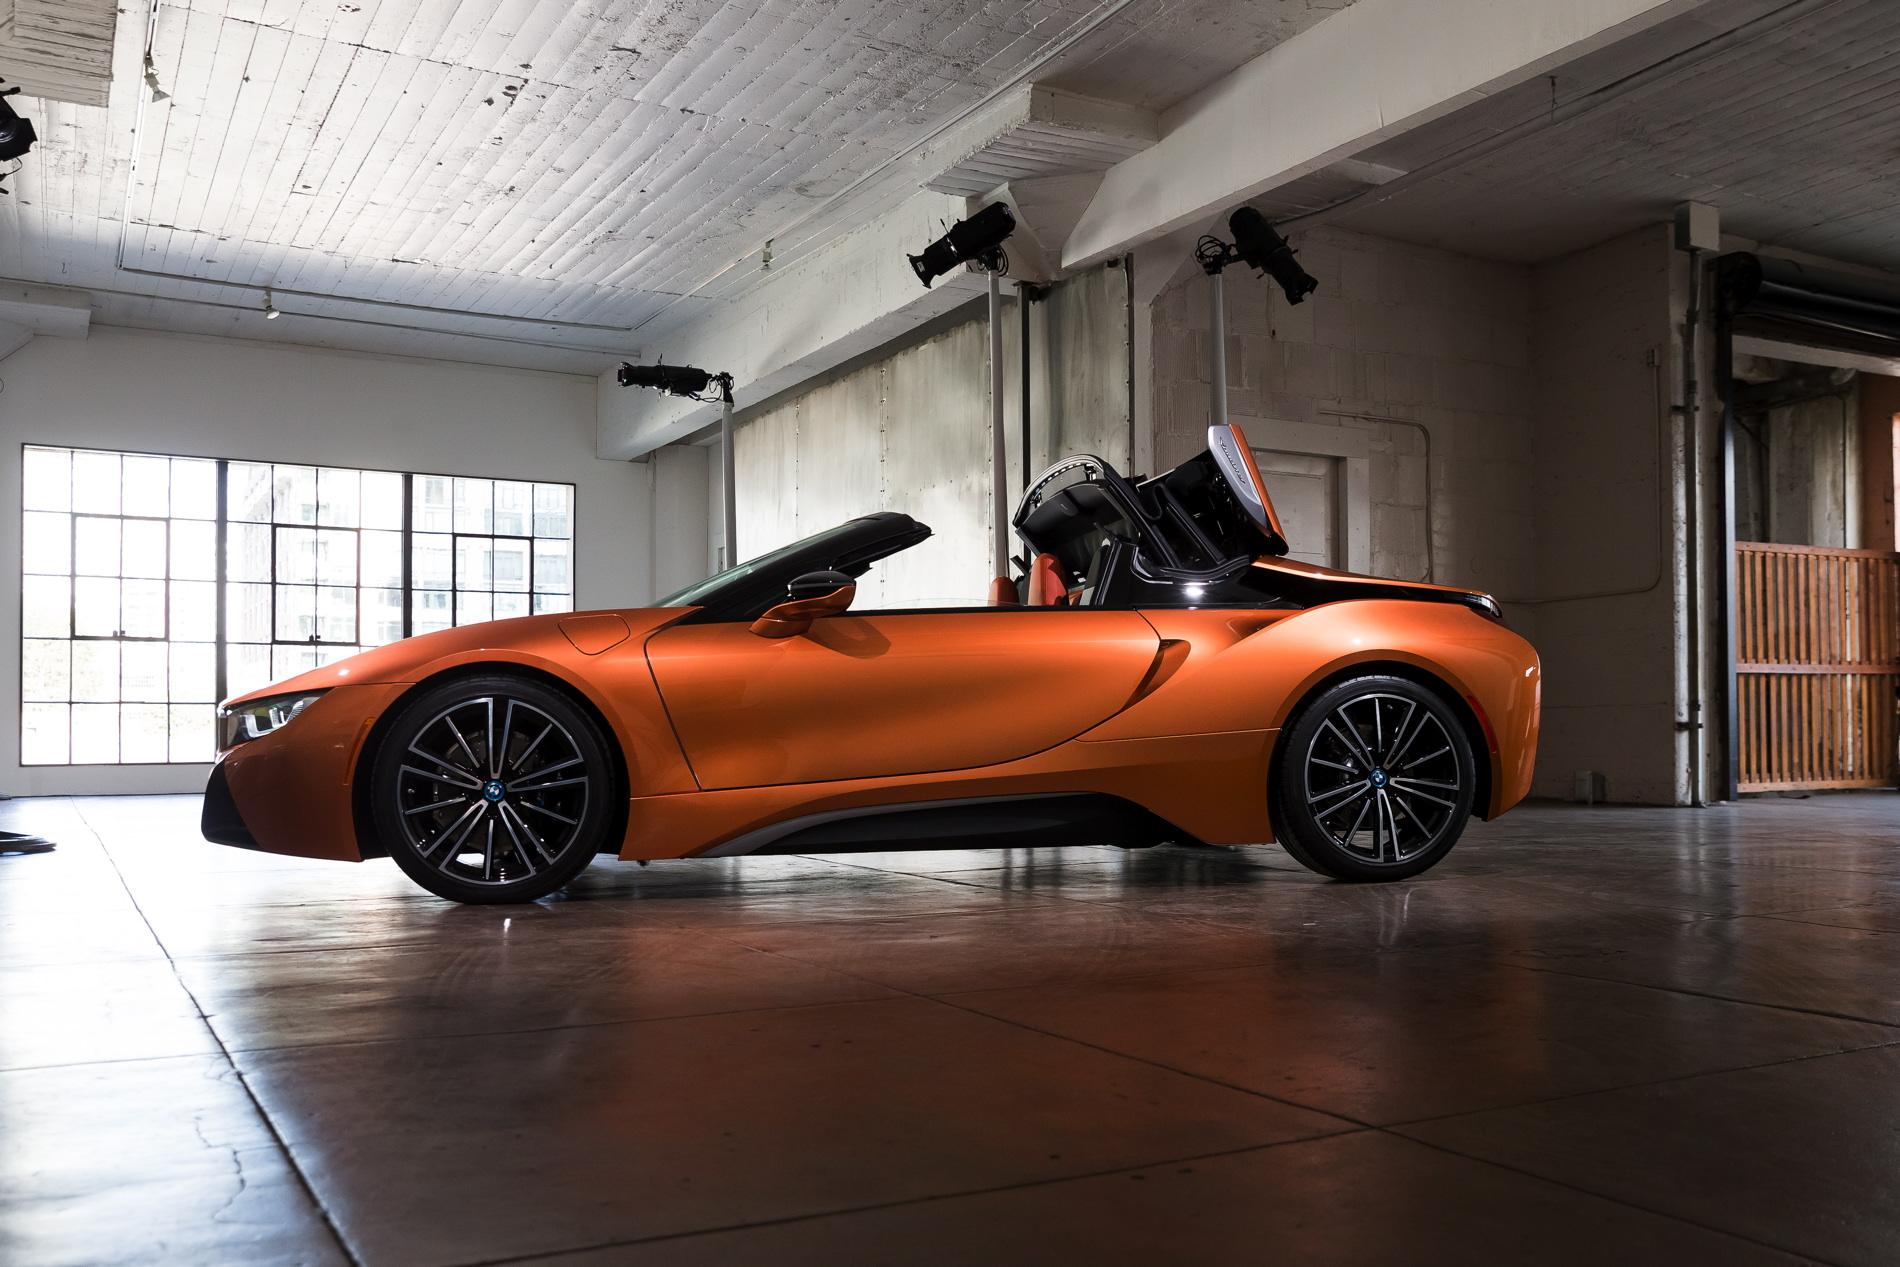 2018-BMW-i8-Roadster-20.jpg